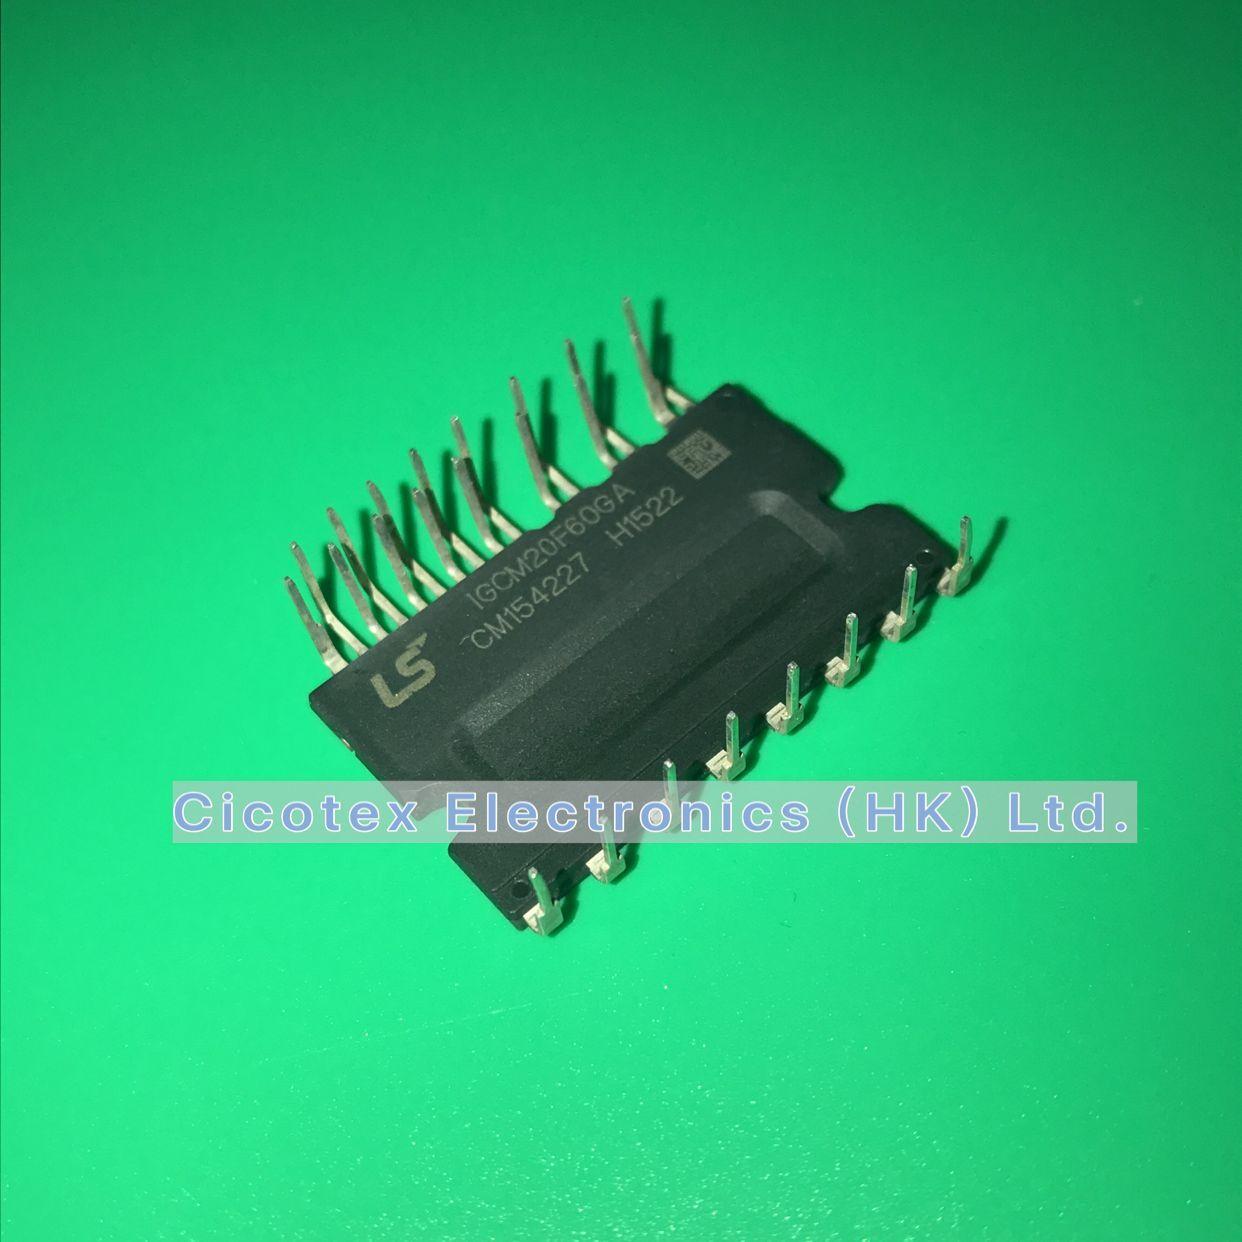 "IGCM20F60GA модуль IGBT модуль драйвера питания IGBT 3 фазы 600V 20A 24-силовой модуль DIP (1,028 "", 26,10 мм) 24MDIP"